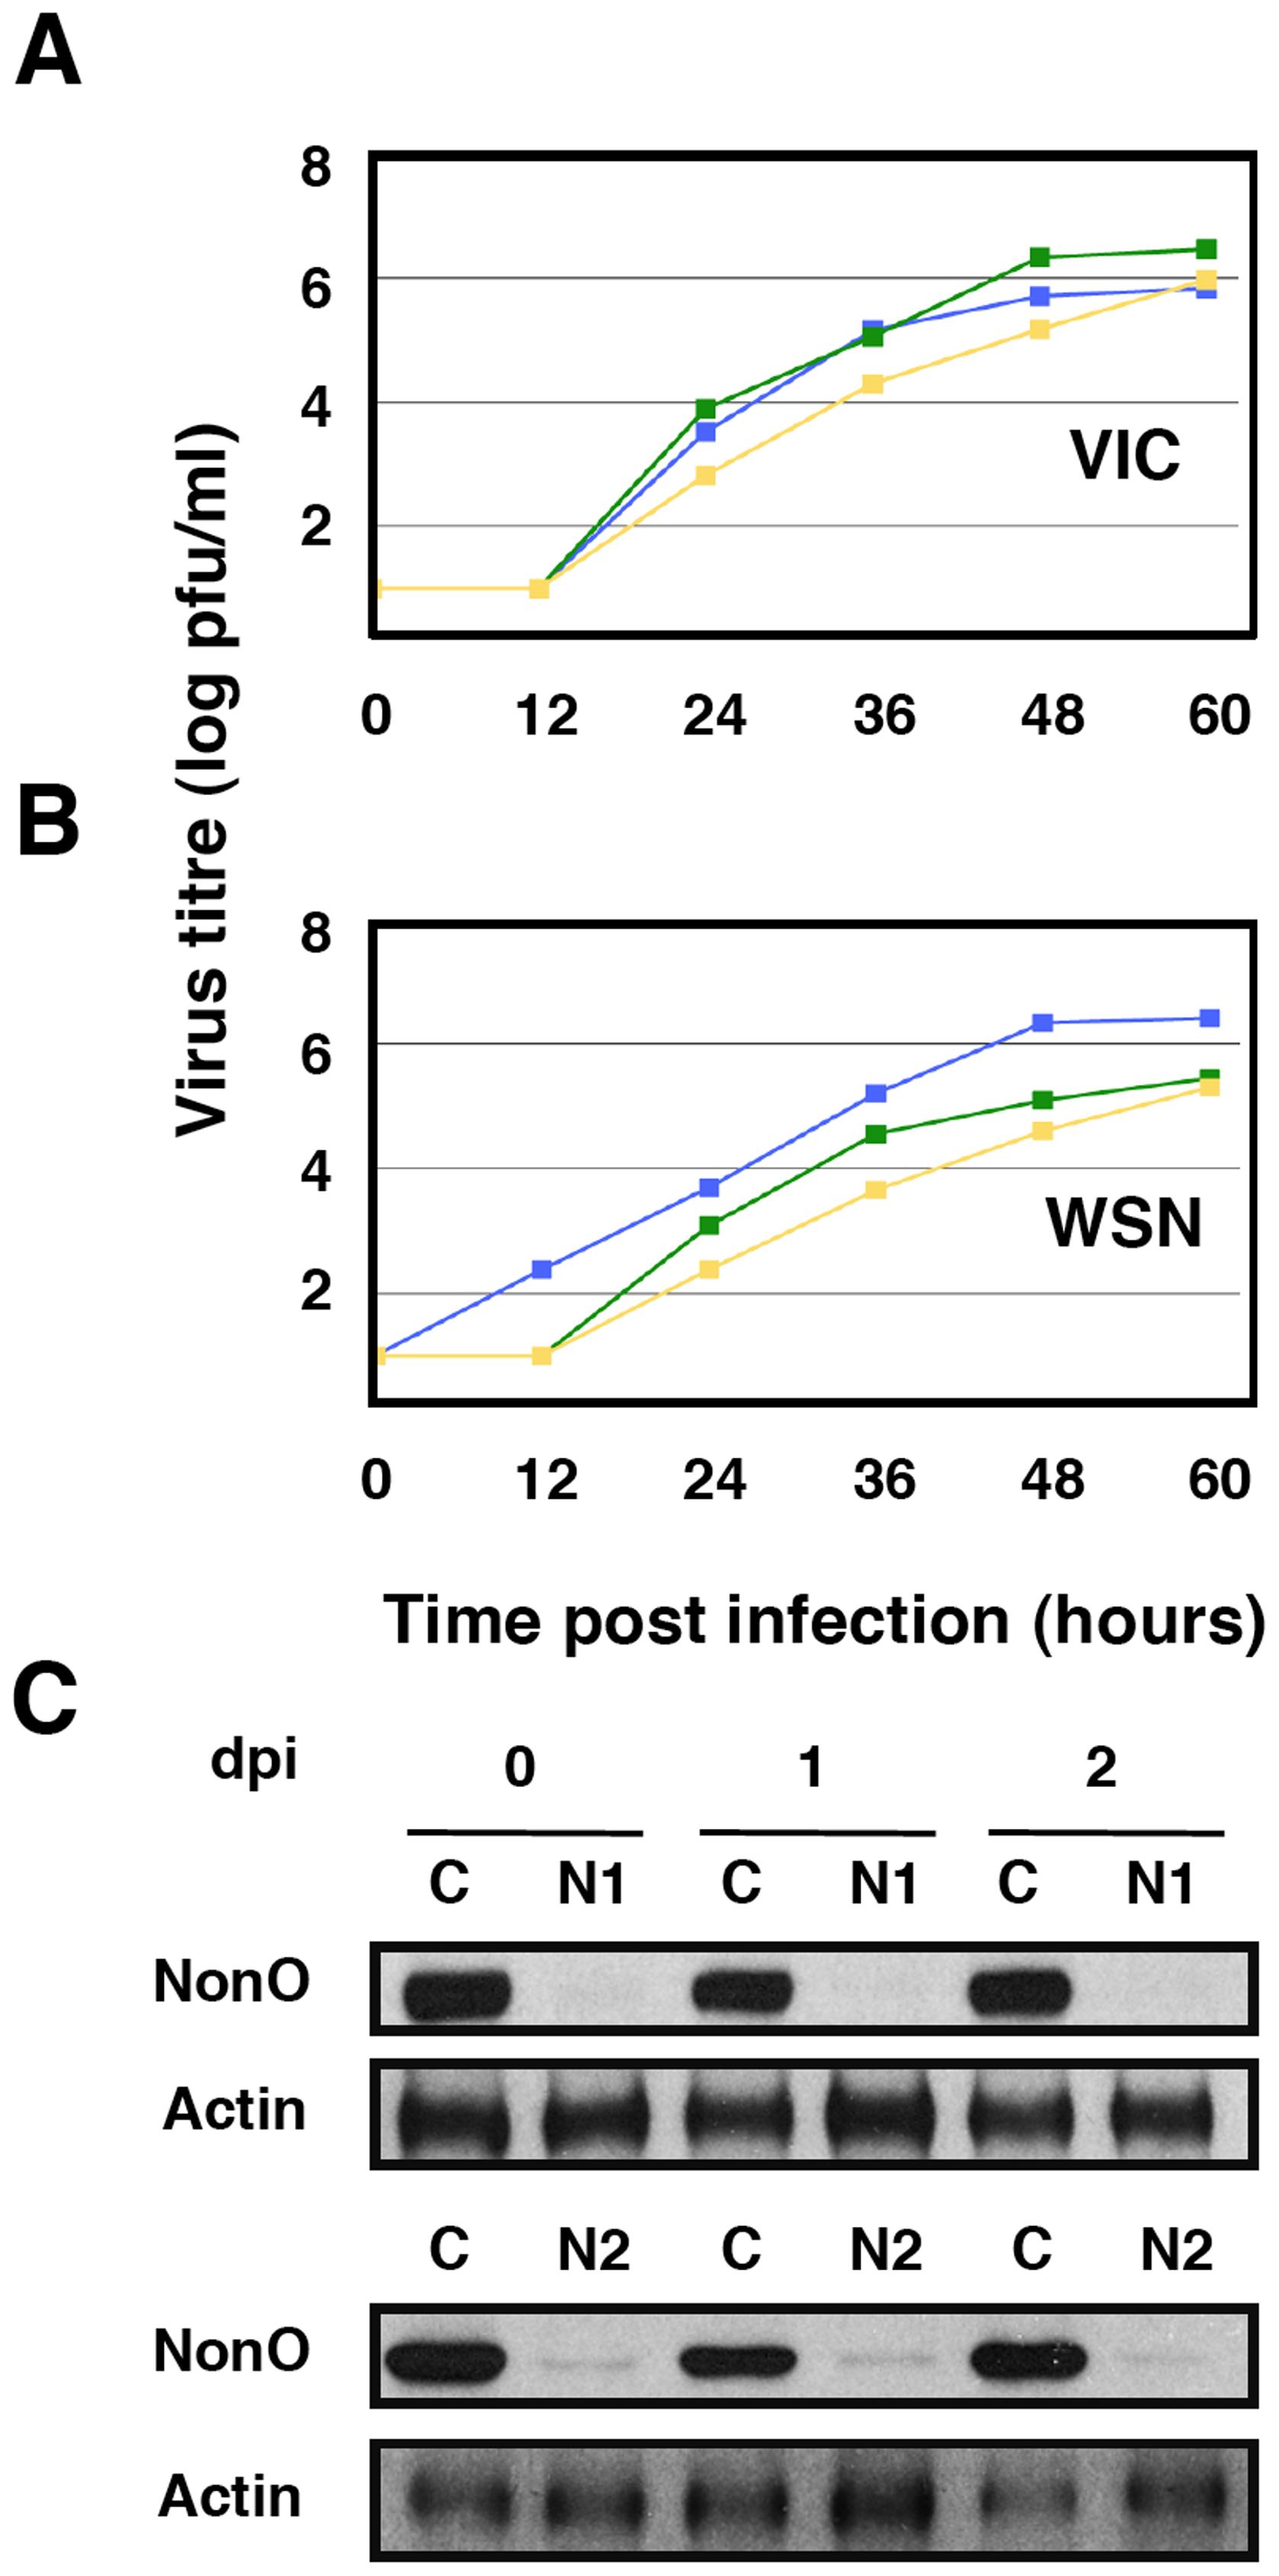 Kinetics of influenza virus multiplication in NonO-silenced cells.